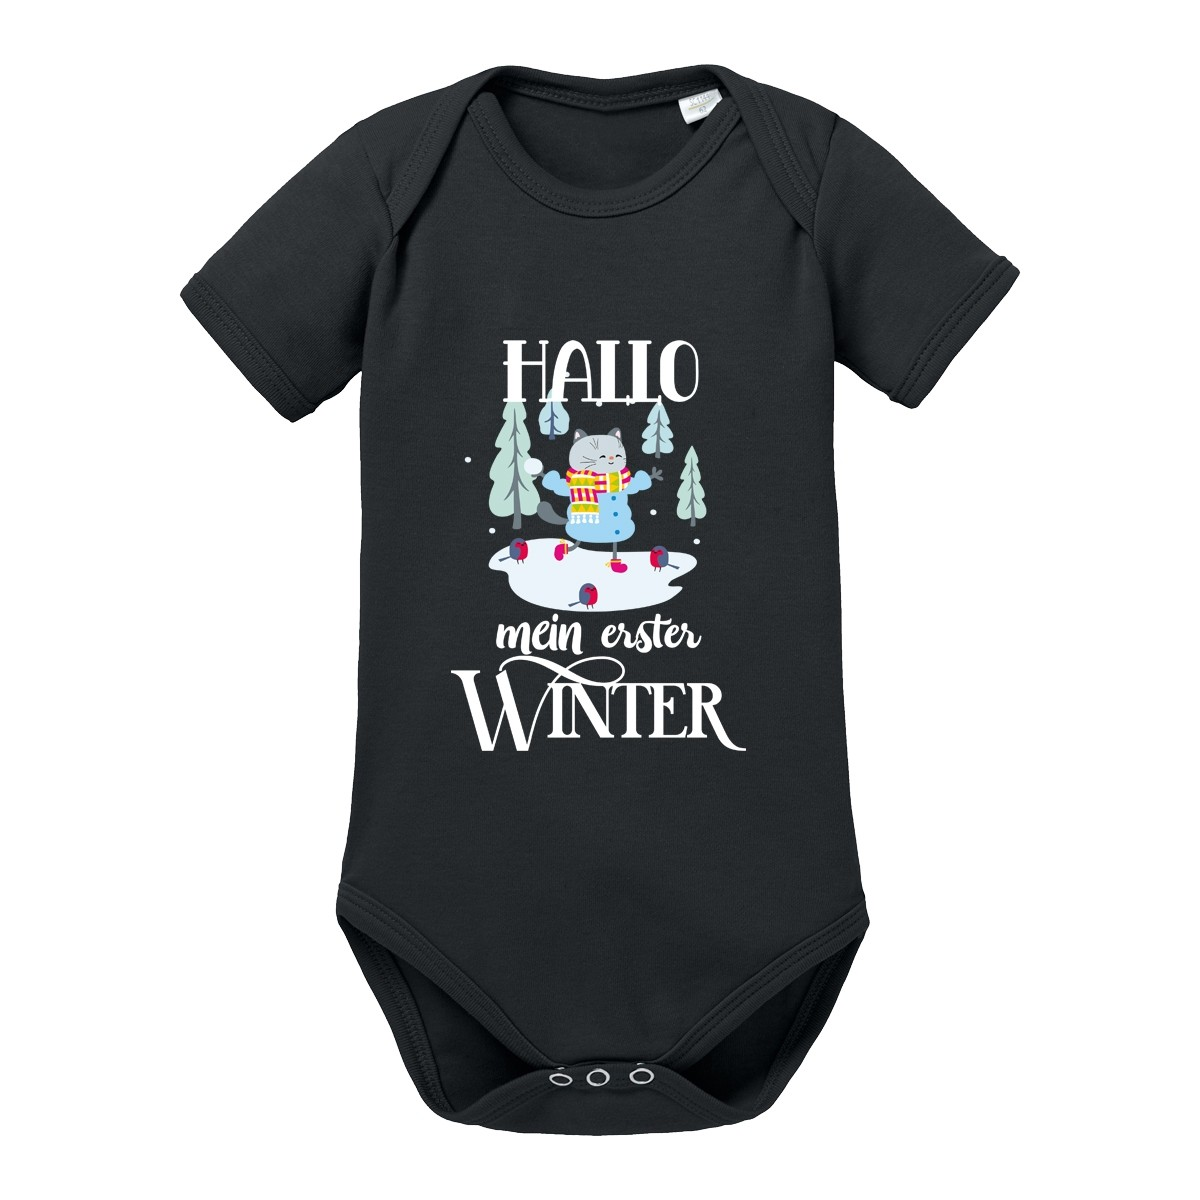 Babybody - Modell: Hallo mein erster Winter (Junge)